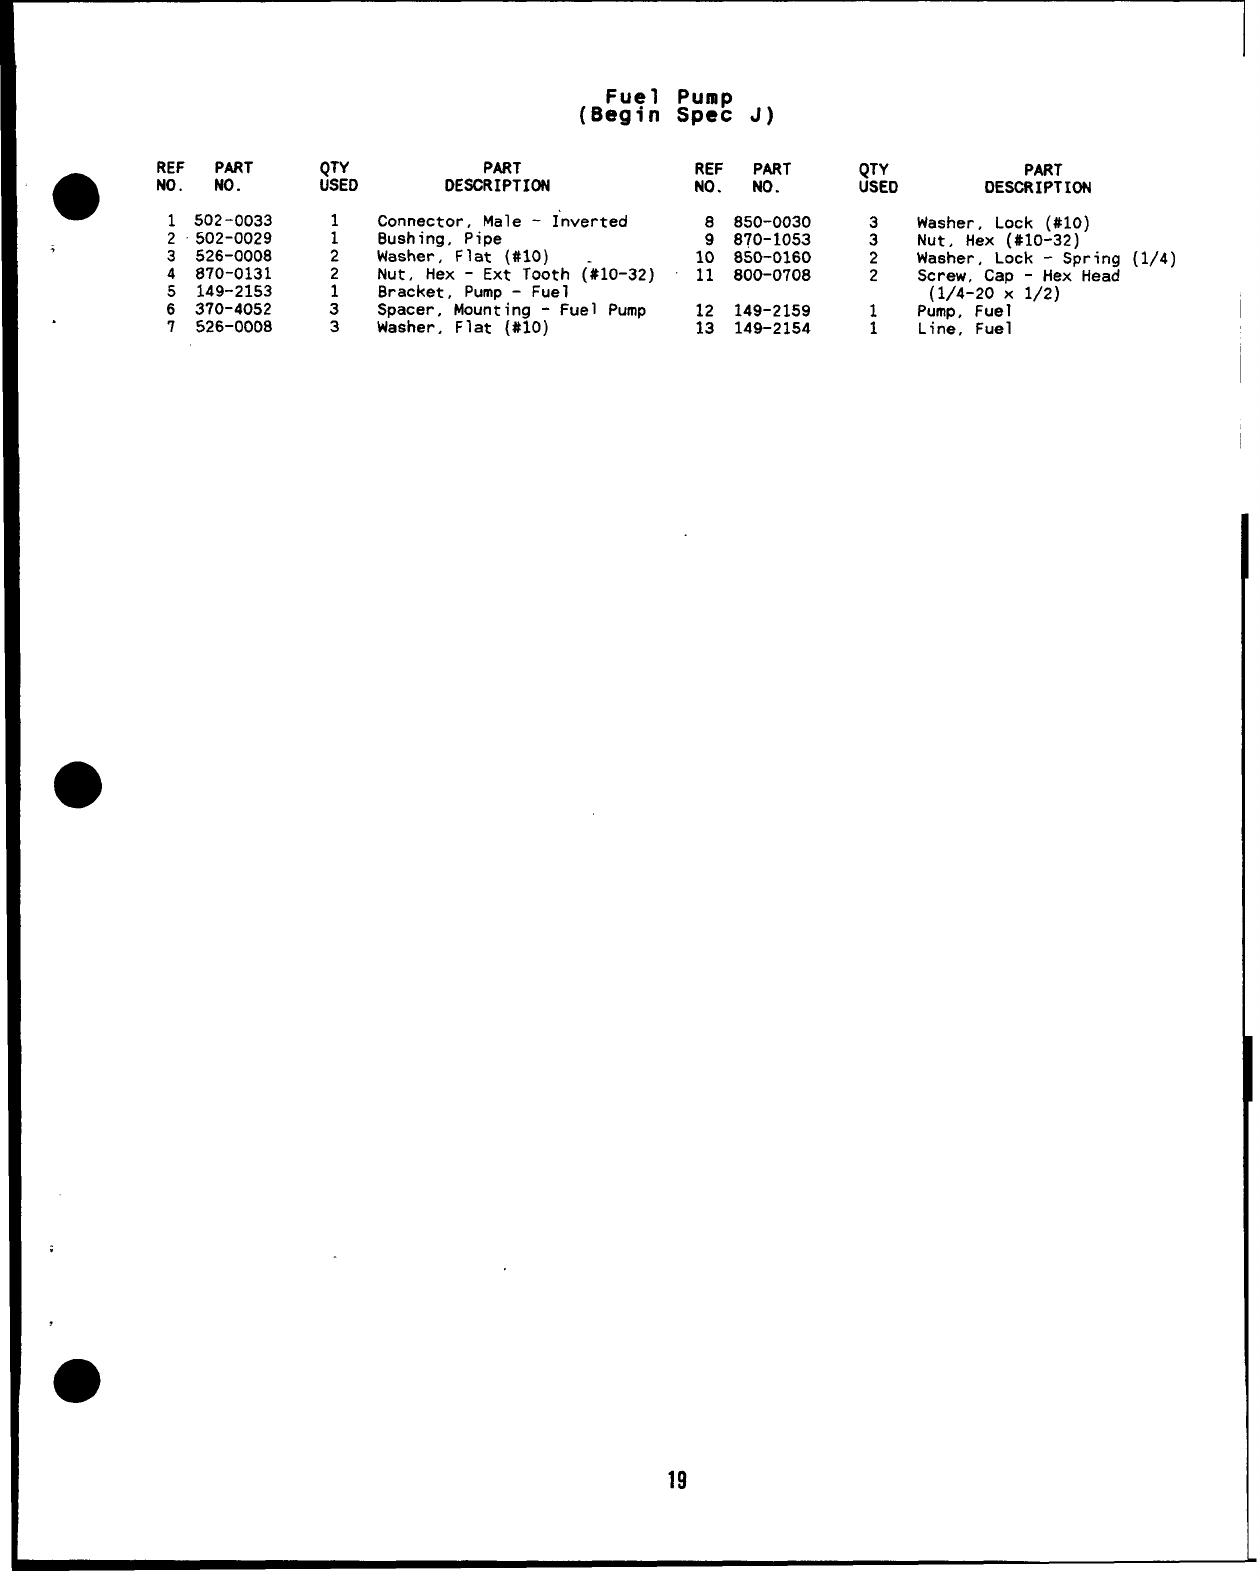 927 0224 Onan Mcck Spec H J Marine Genset Parts Manual 05 1988small Fuel Pump Specification Ref Part Qty